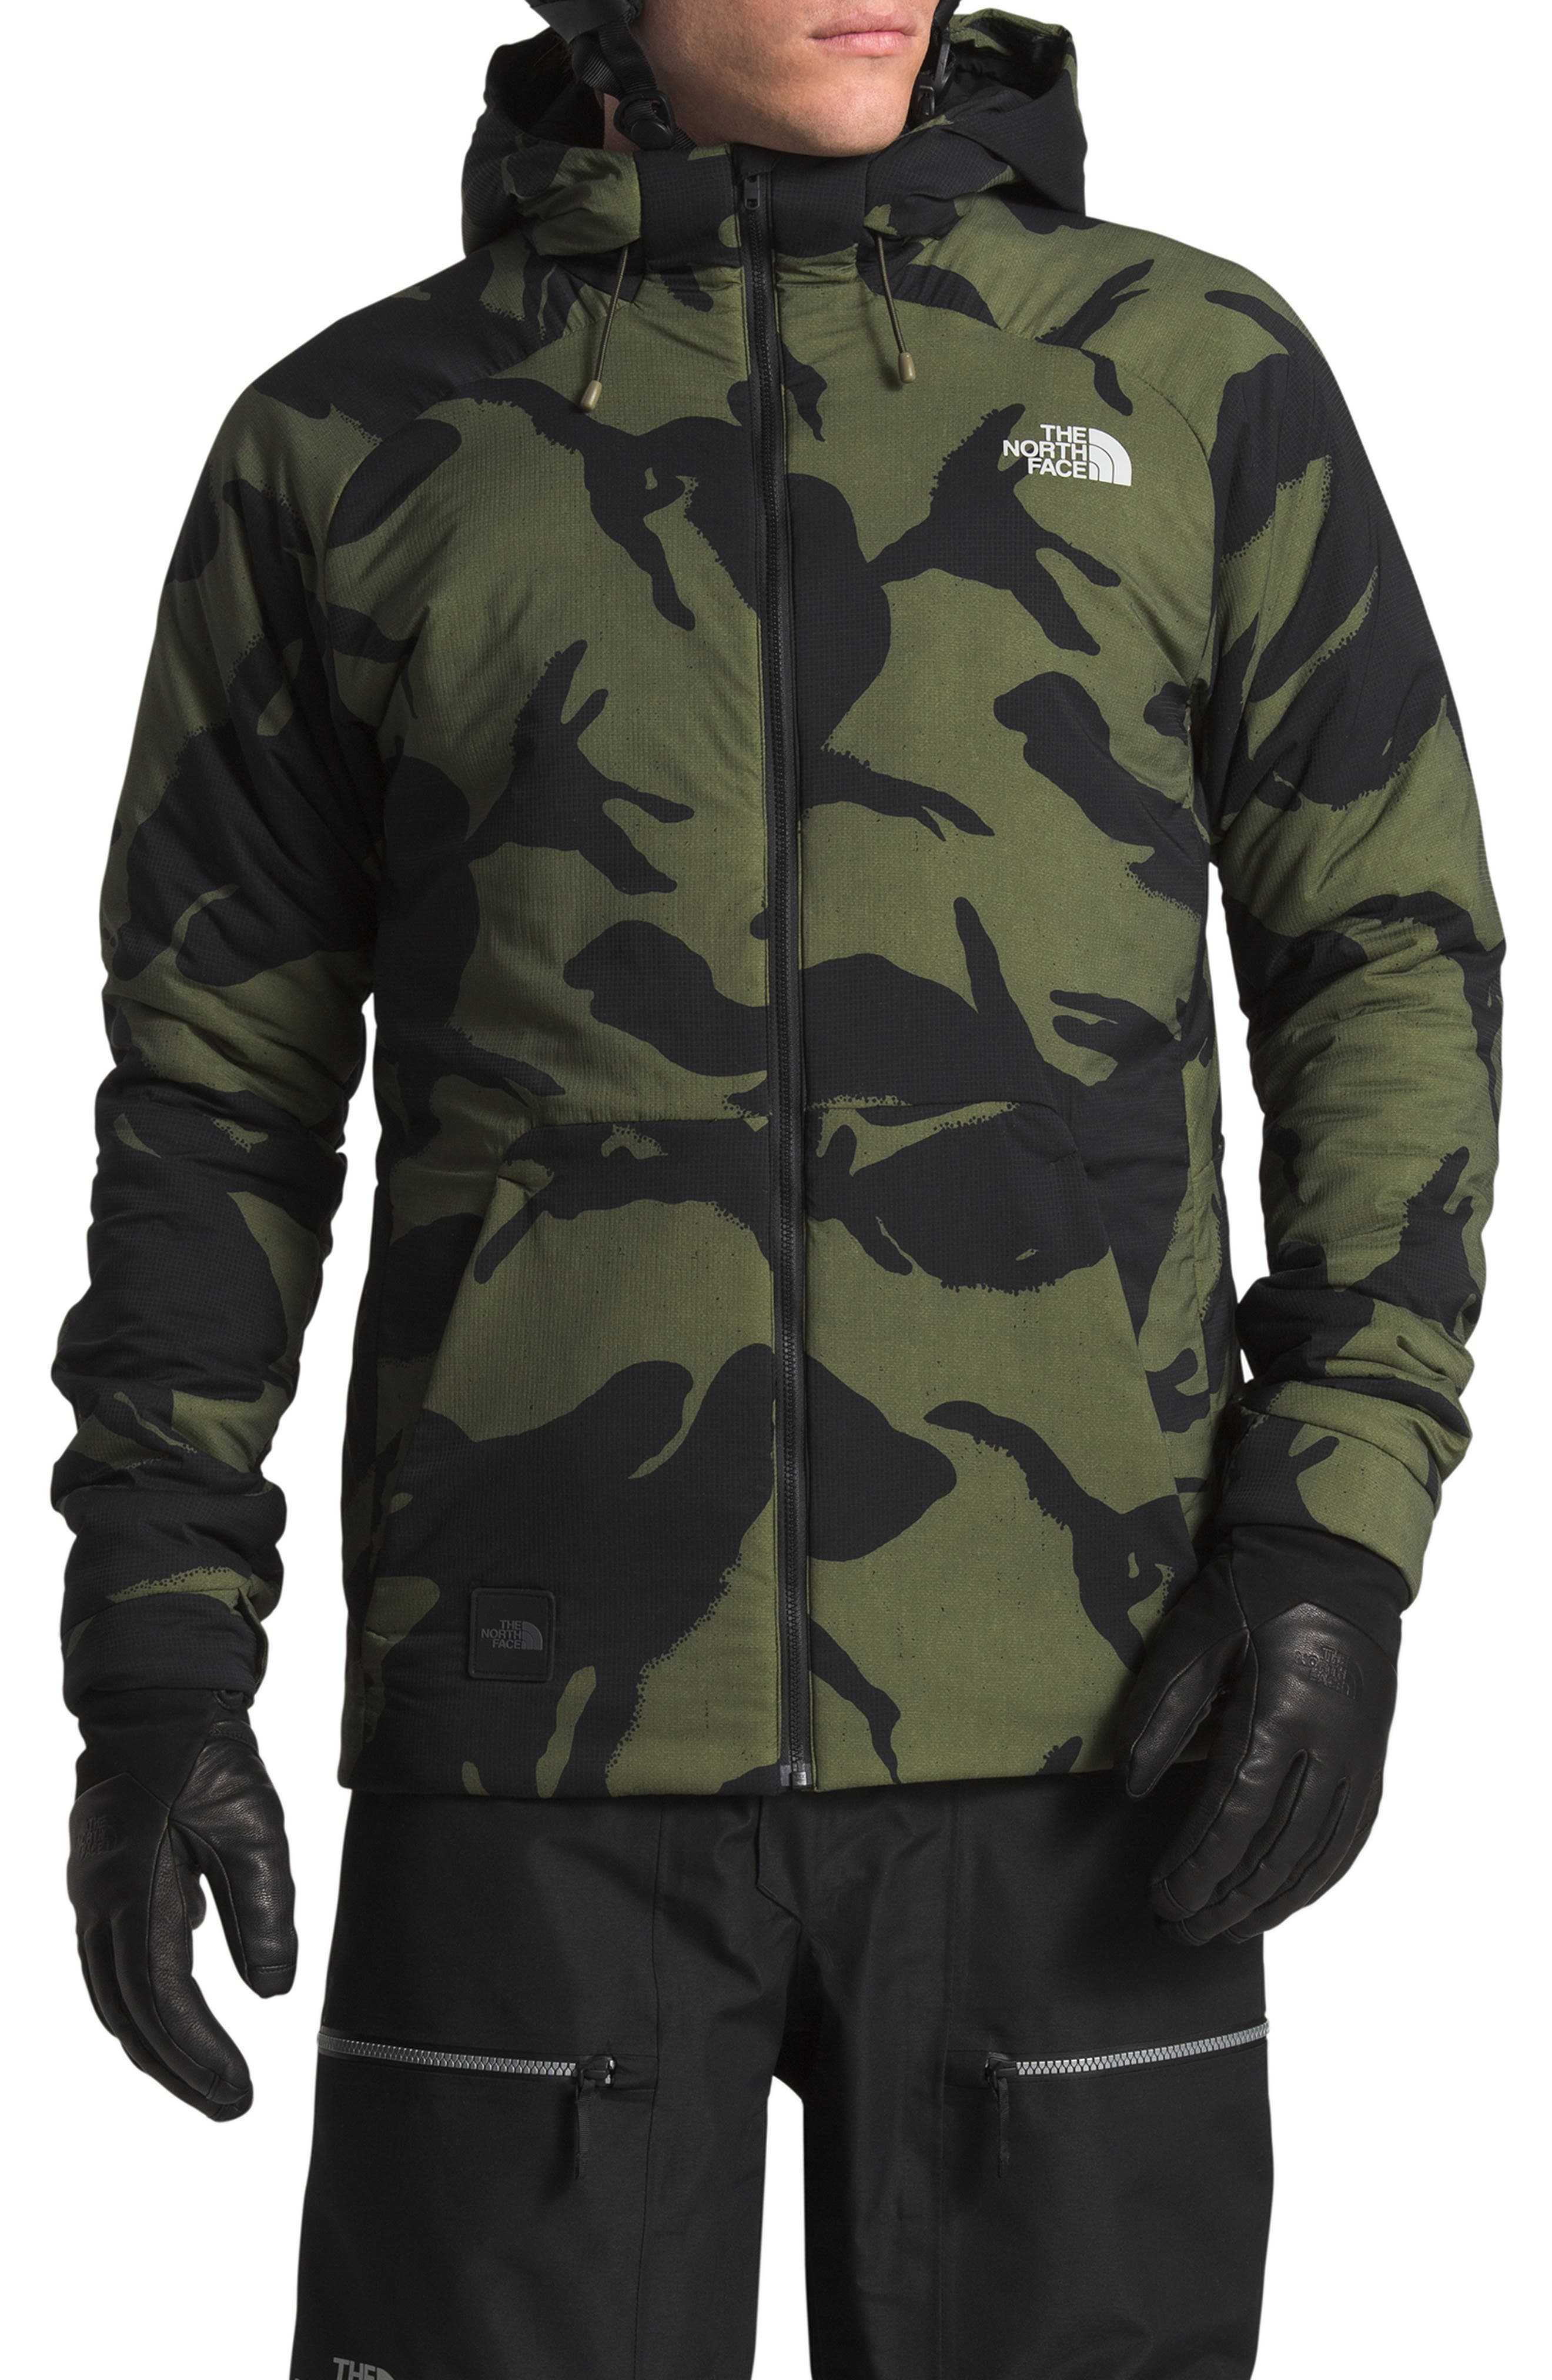 Lodgefather Ventrix<sup>™</sup> Ski Jacket,                             Main thumbnail 1, color,                             BURNT OLIVE GREEN DISRUPT